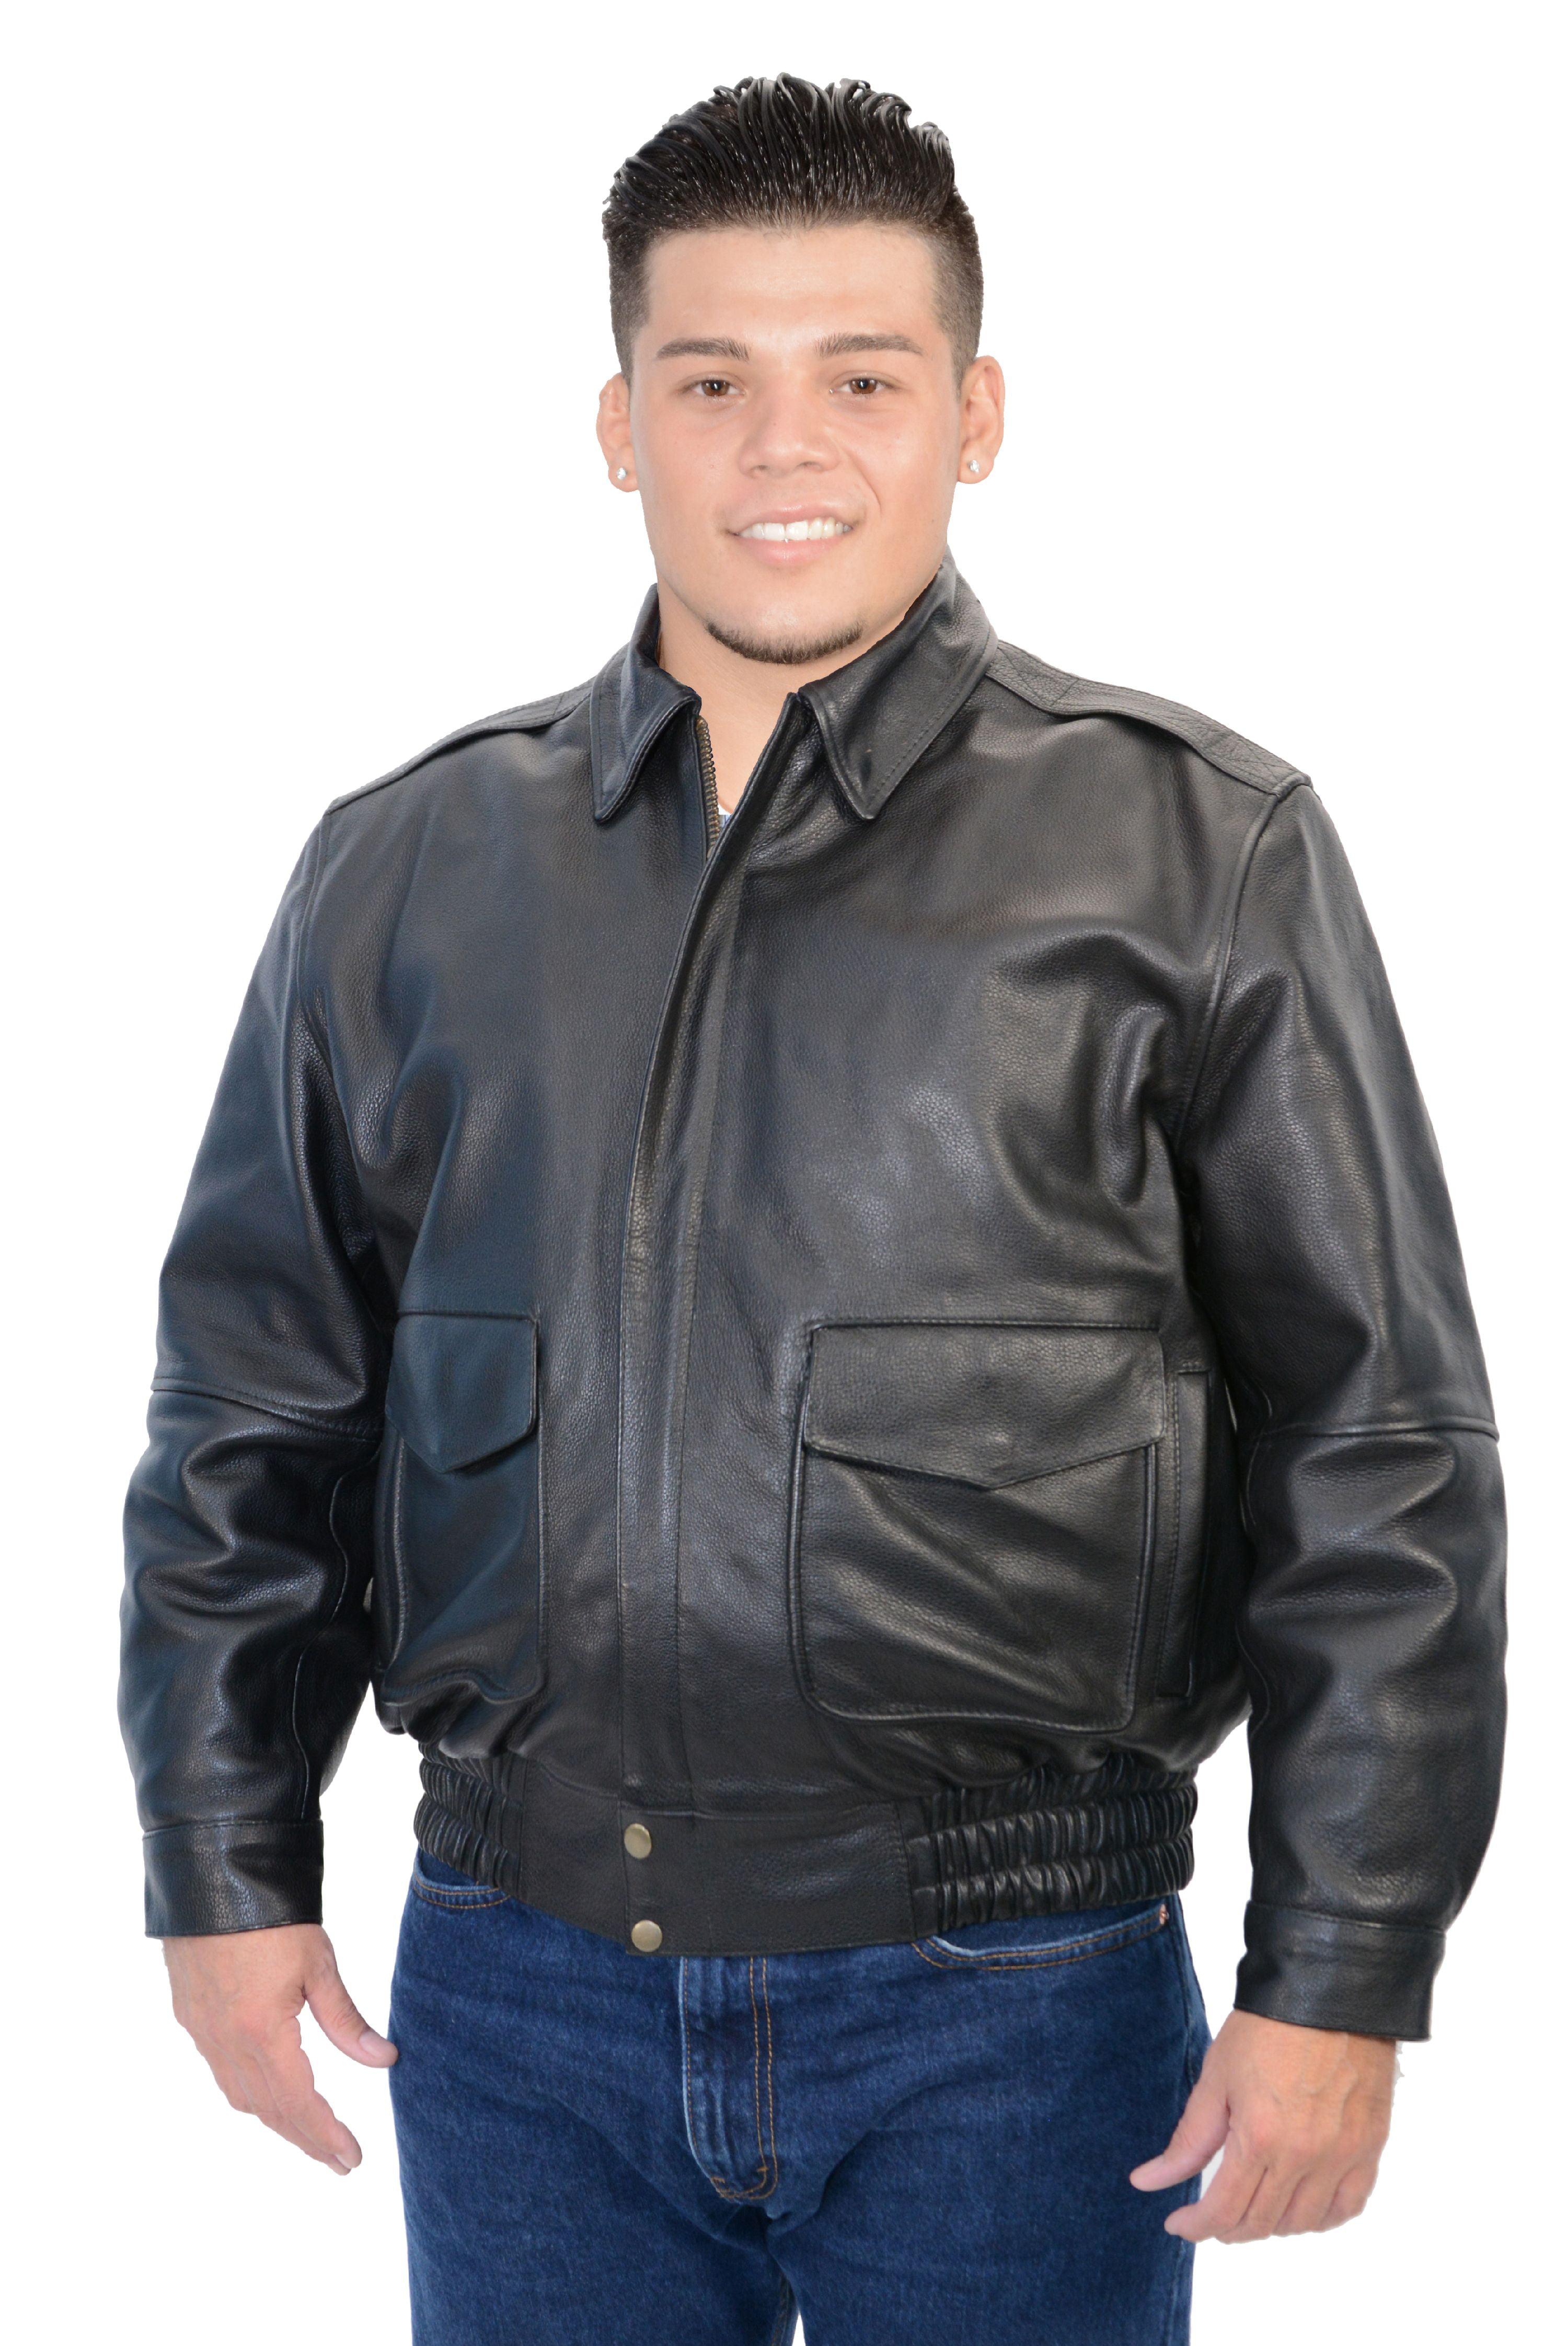 Milwaukee Leather Men/'s Classic Police Style M//C Jacket Big 3X  Black